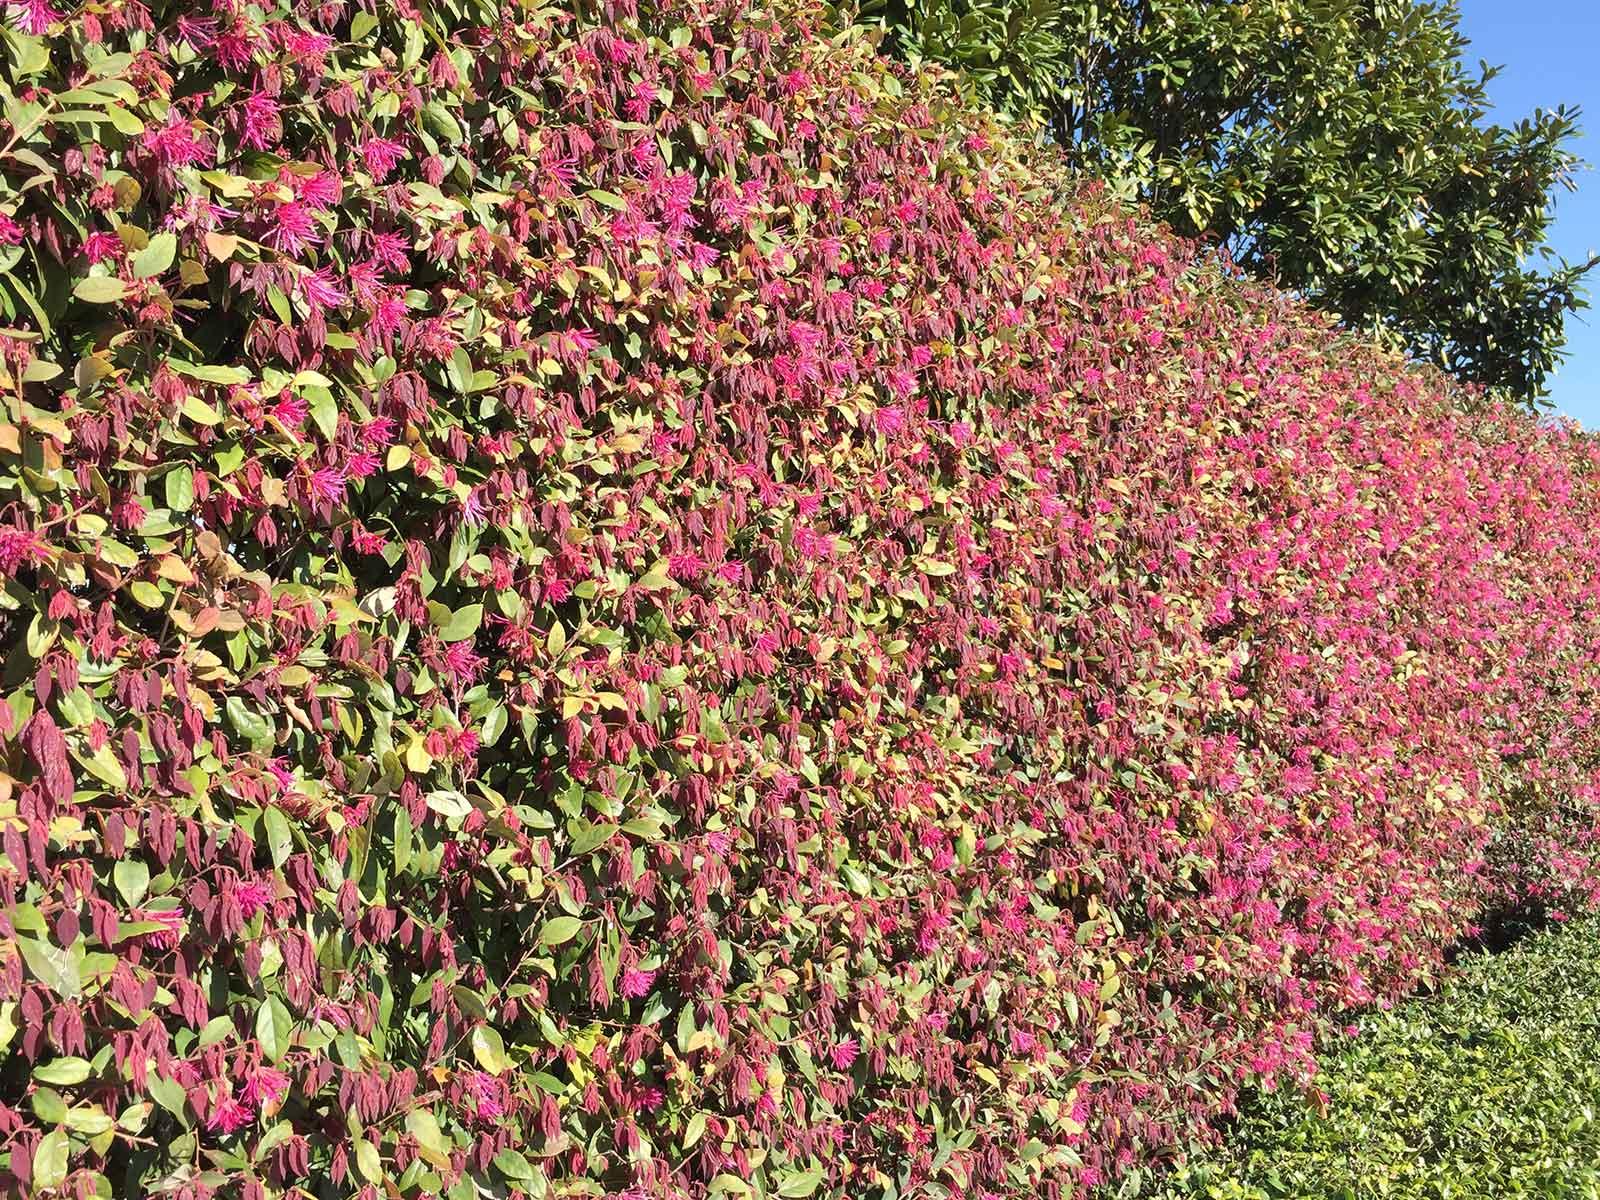 loropetalum-shrub-pink-blooms